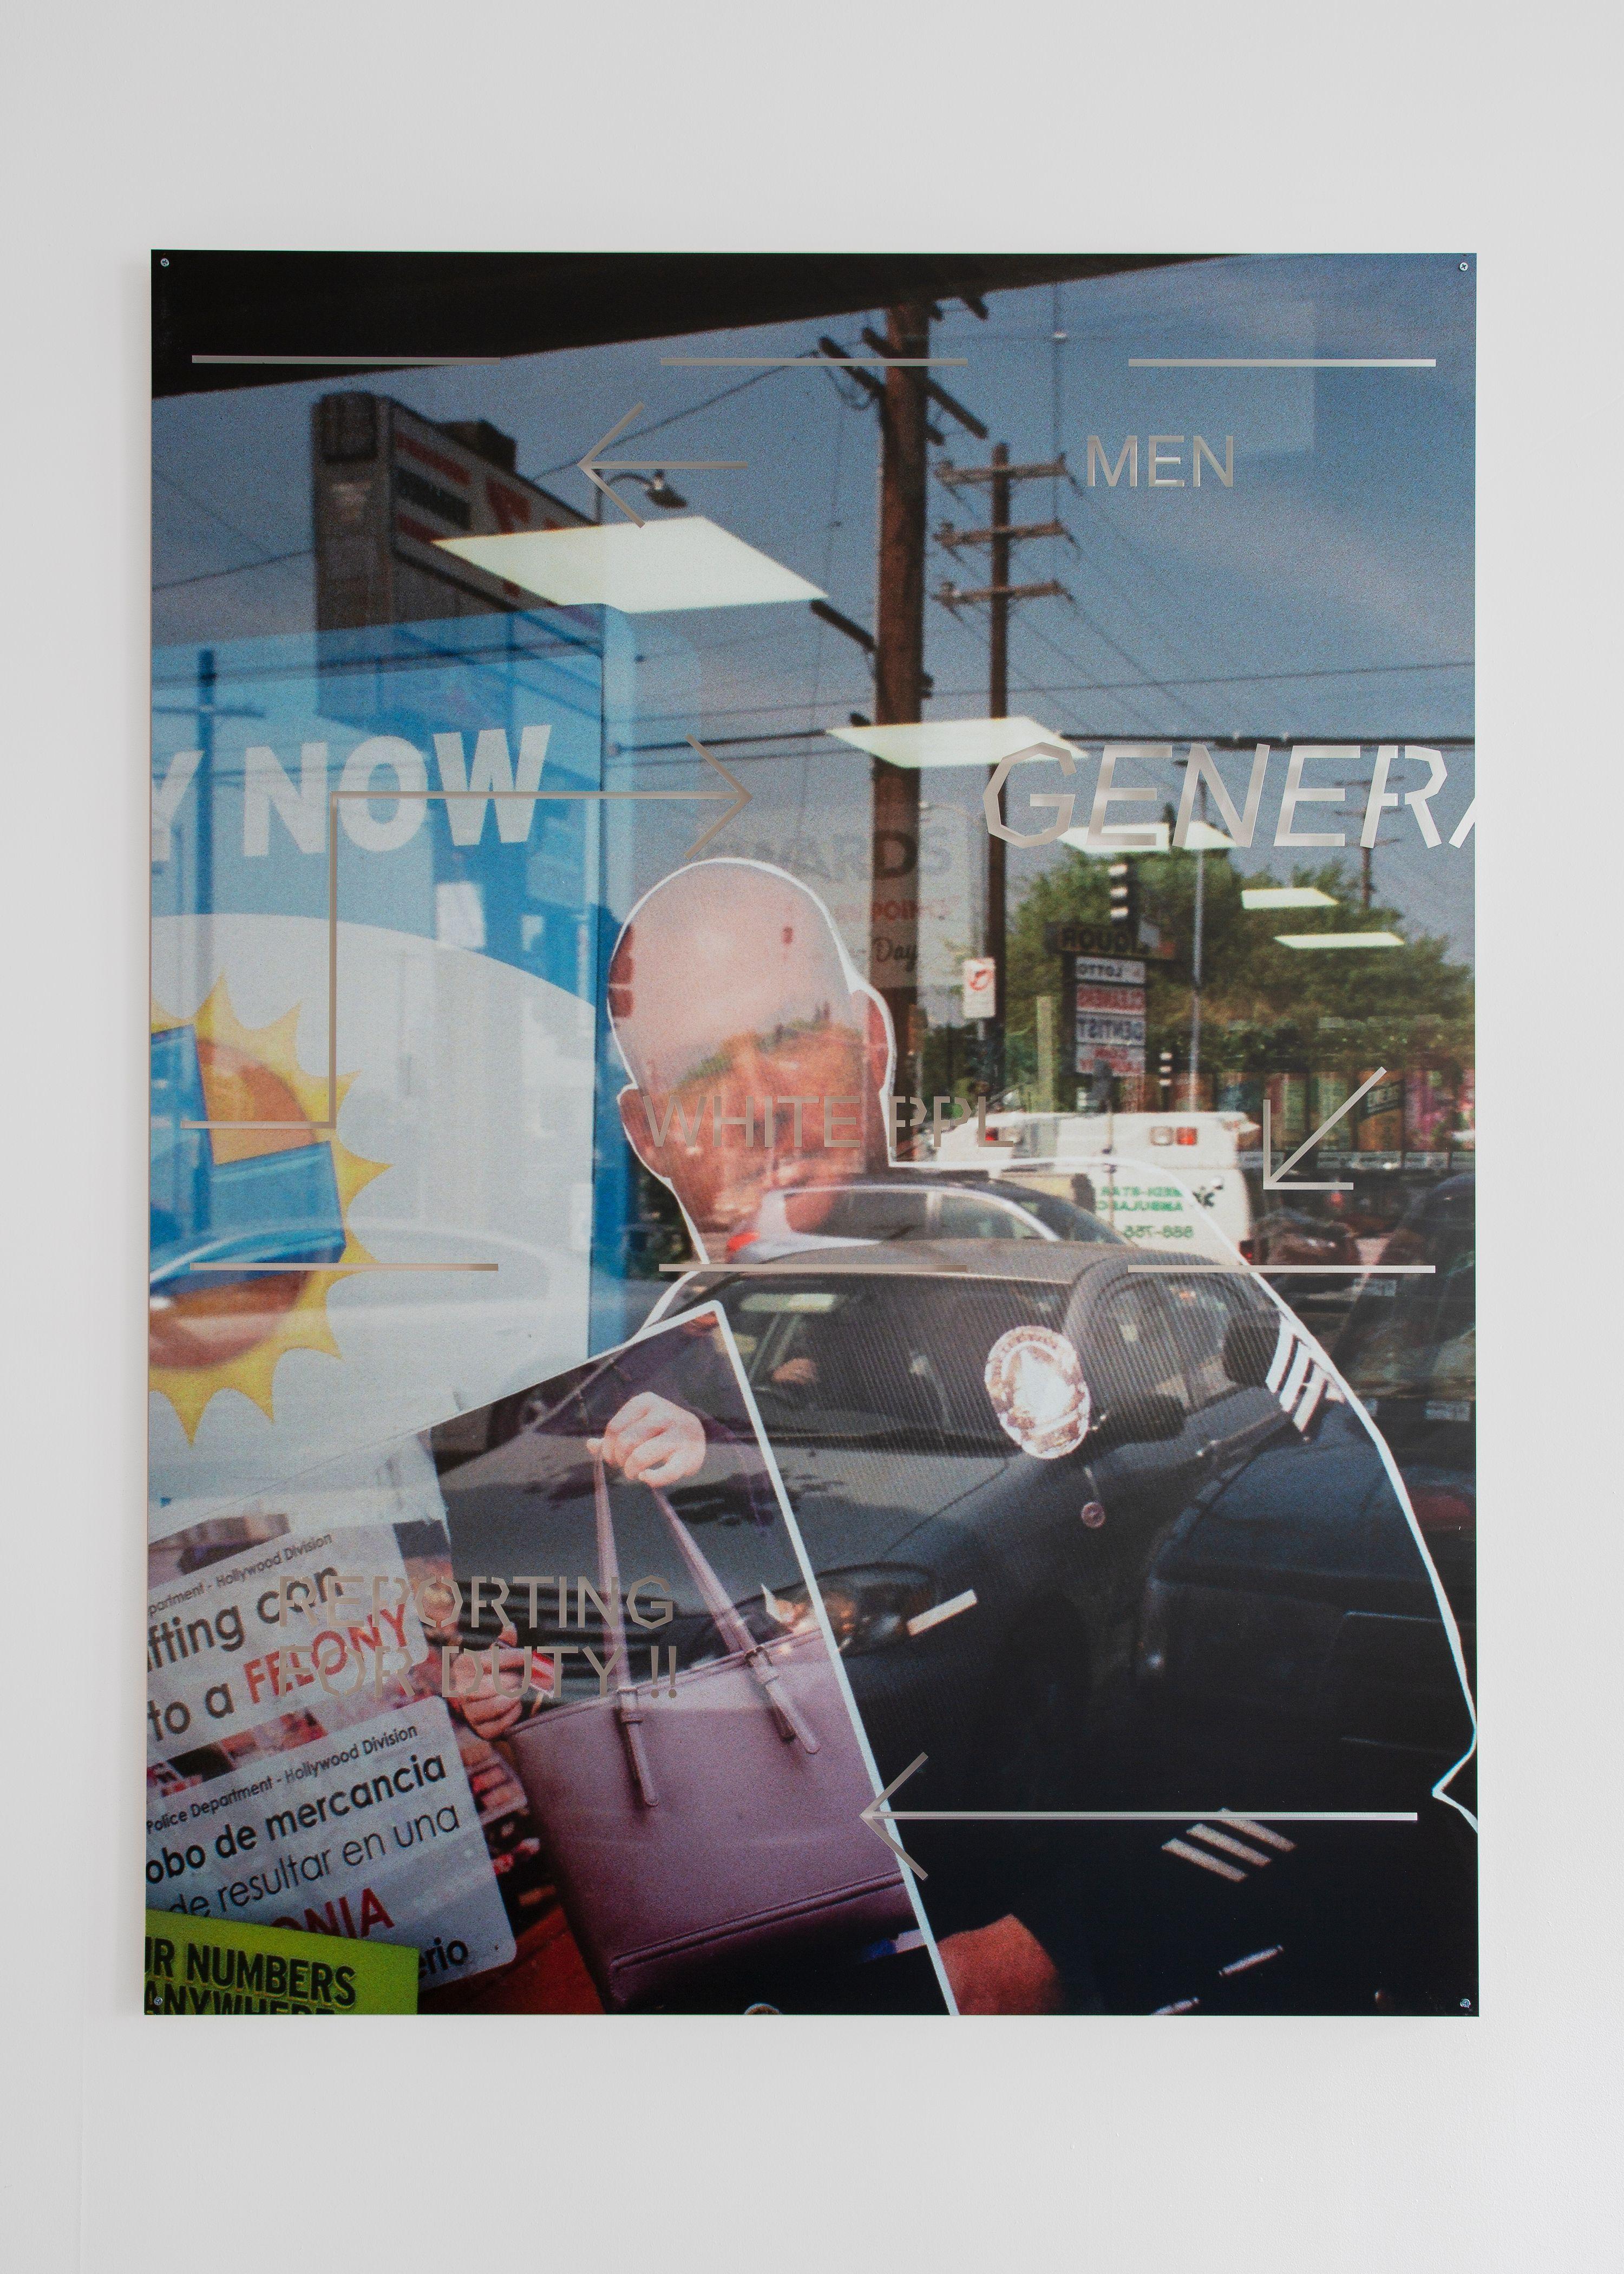 Martine Syms Big Surprise at Bridget Donahue gallery